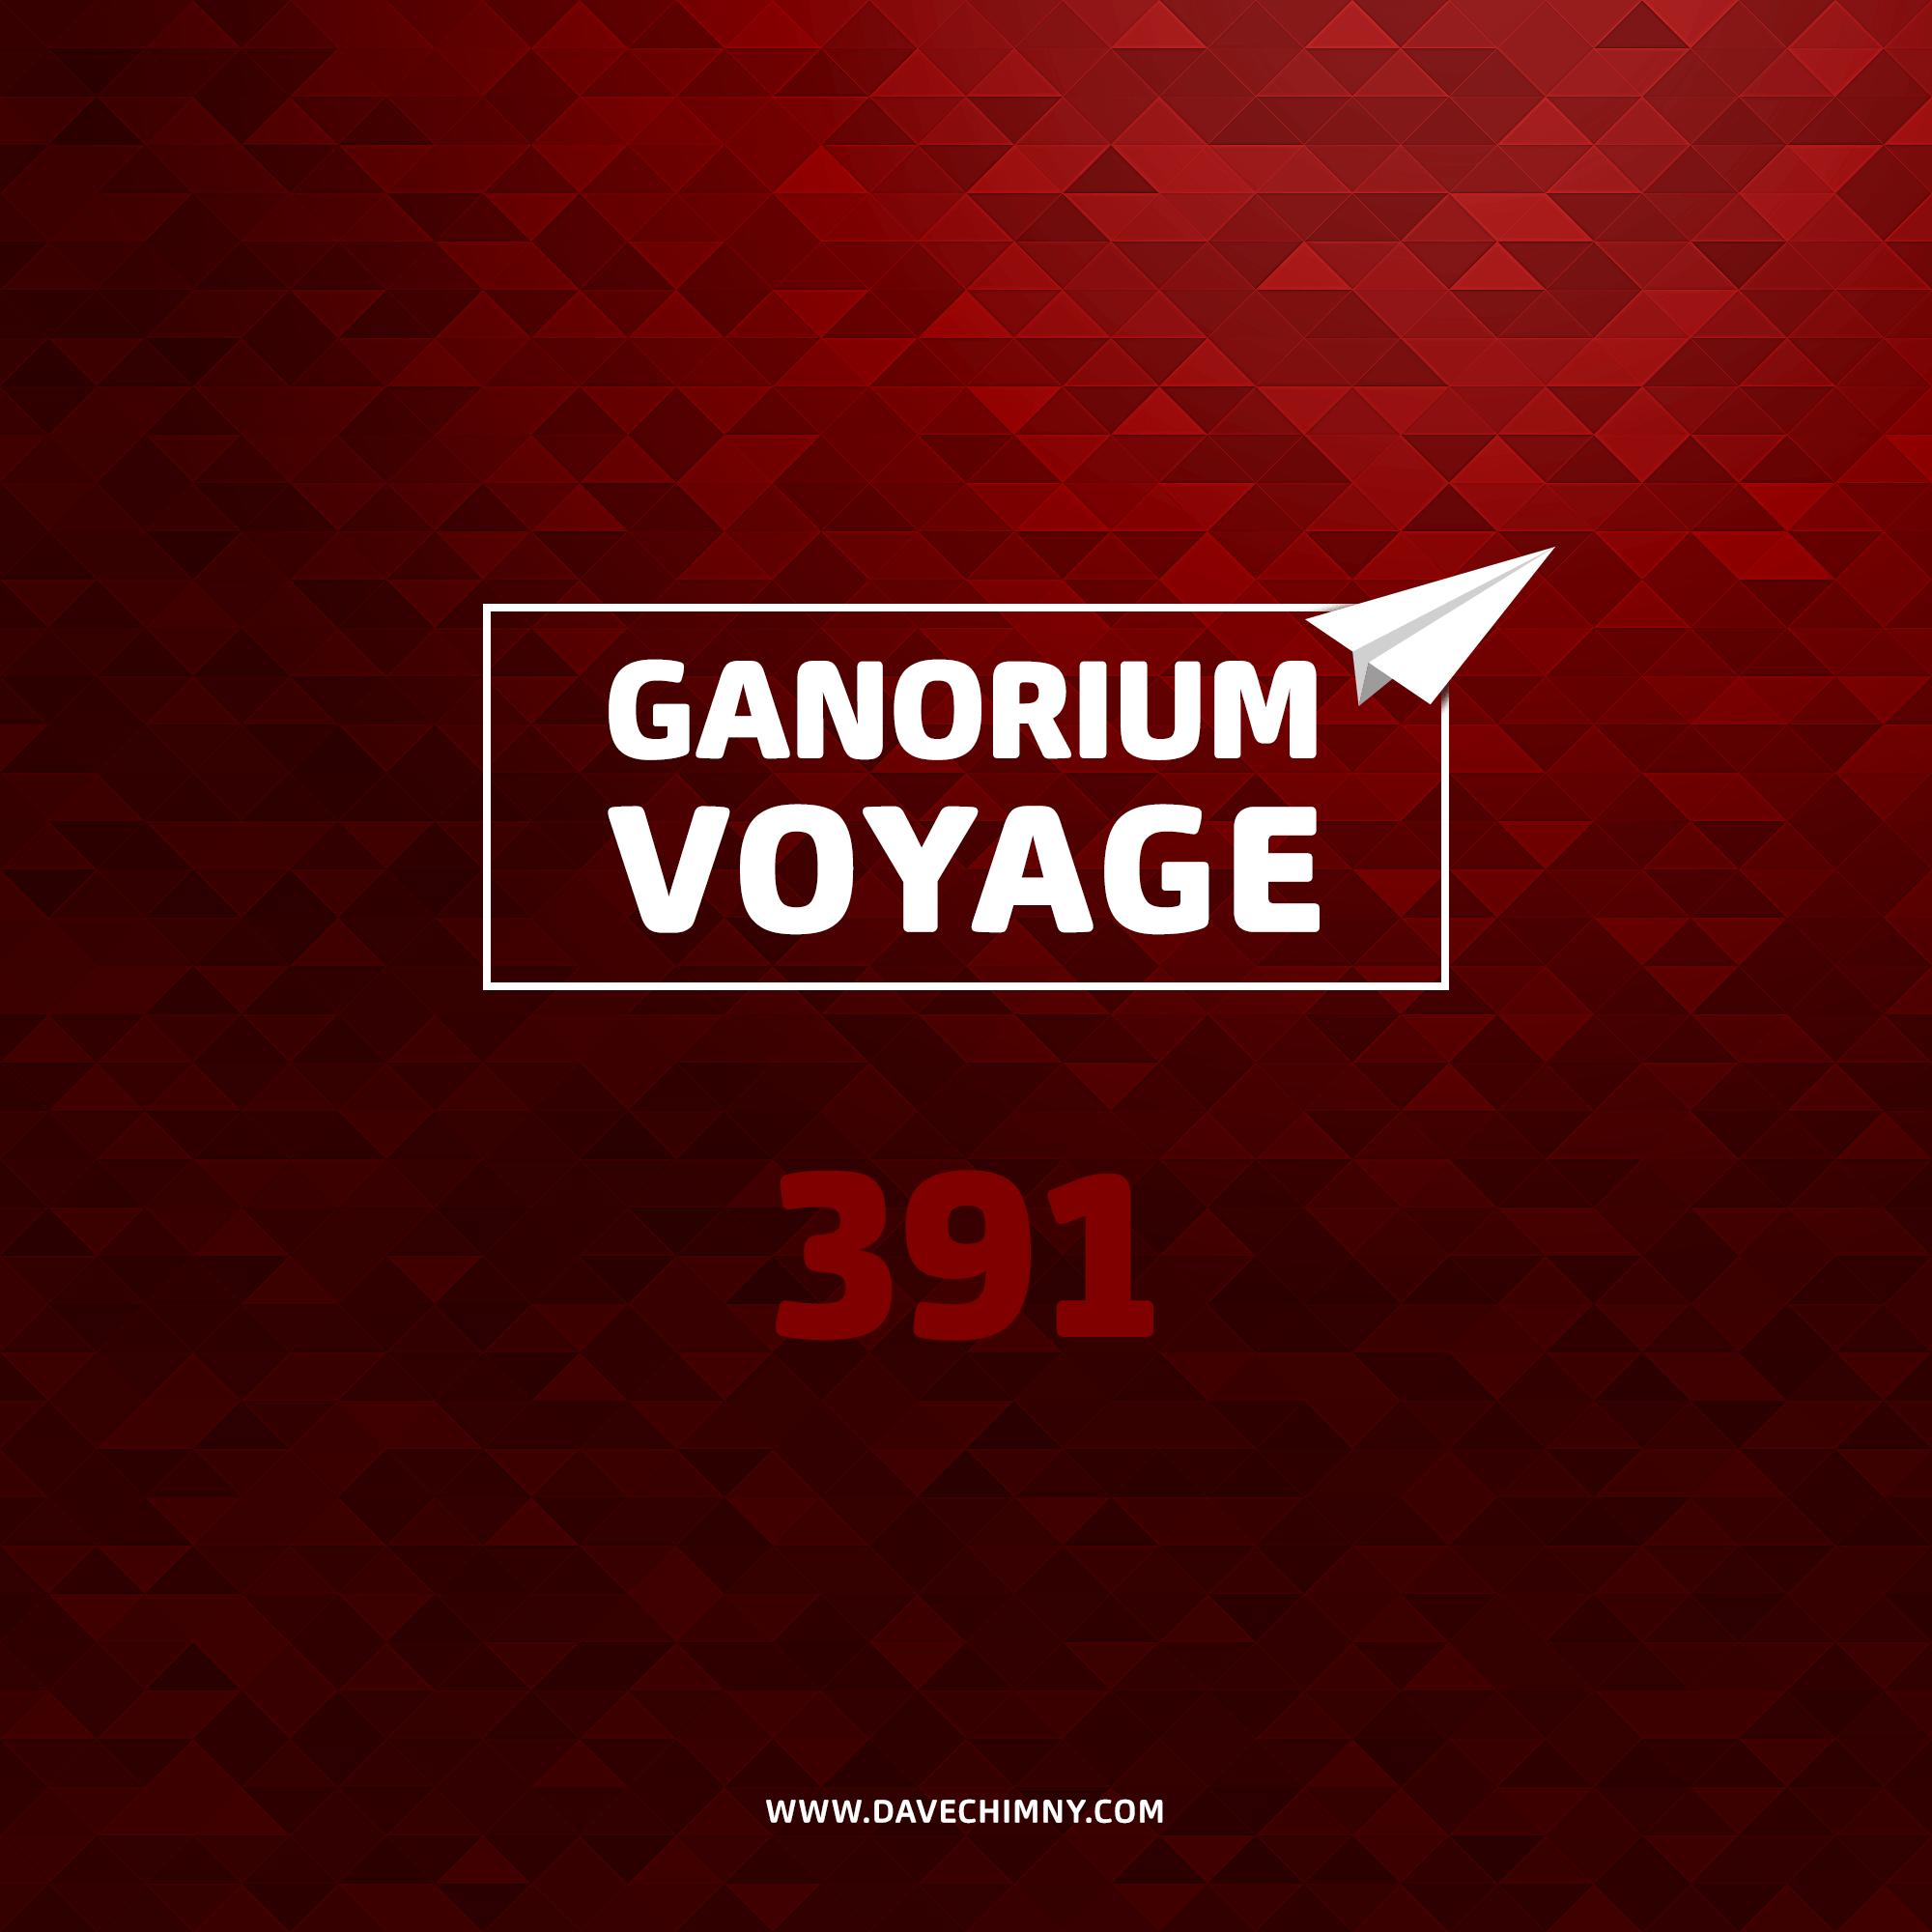 Dave Chimny – Ganorium Voyage 391